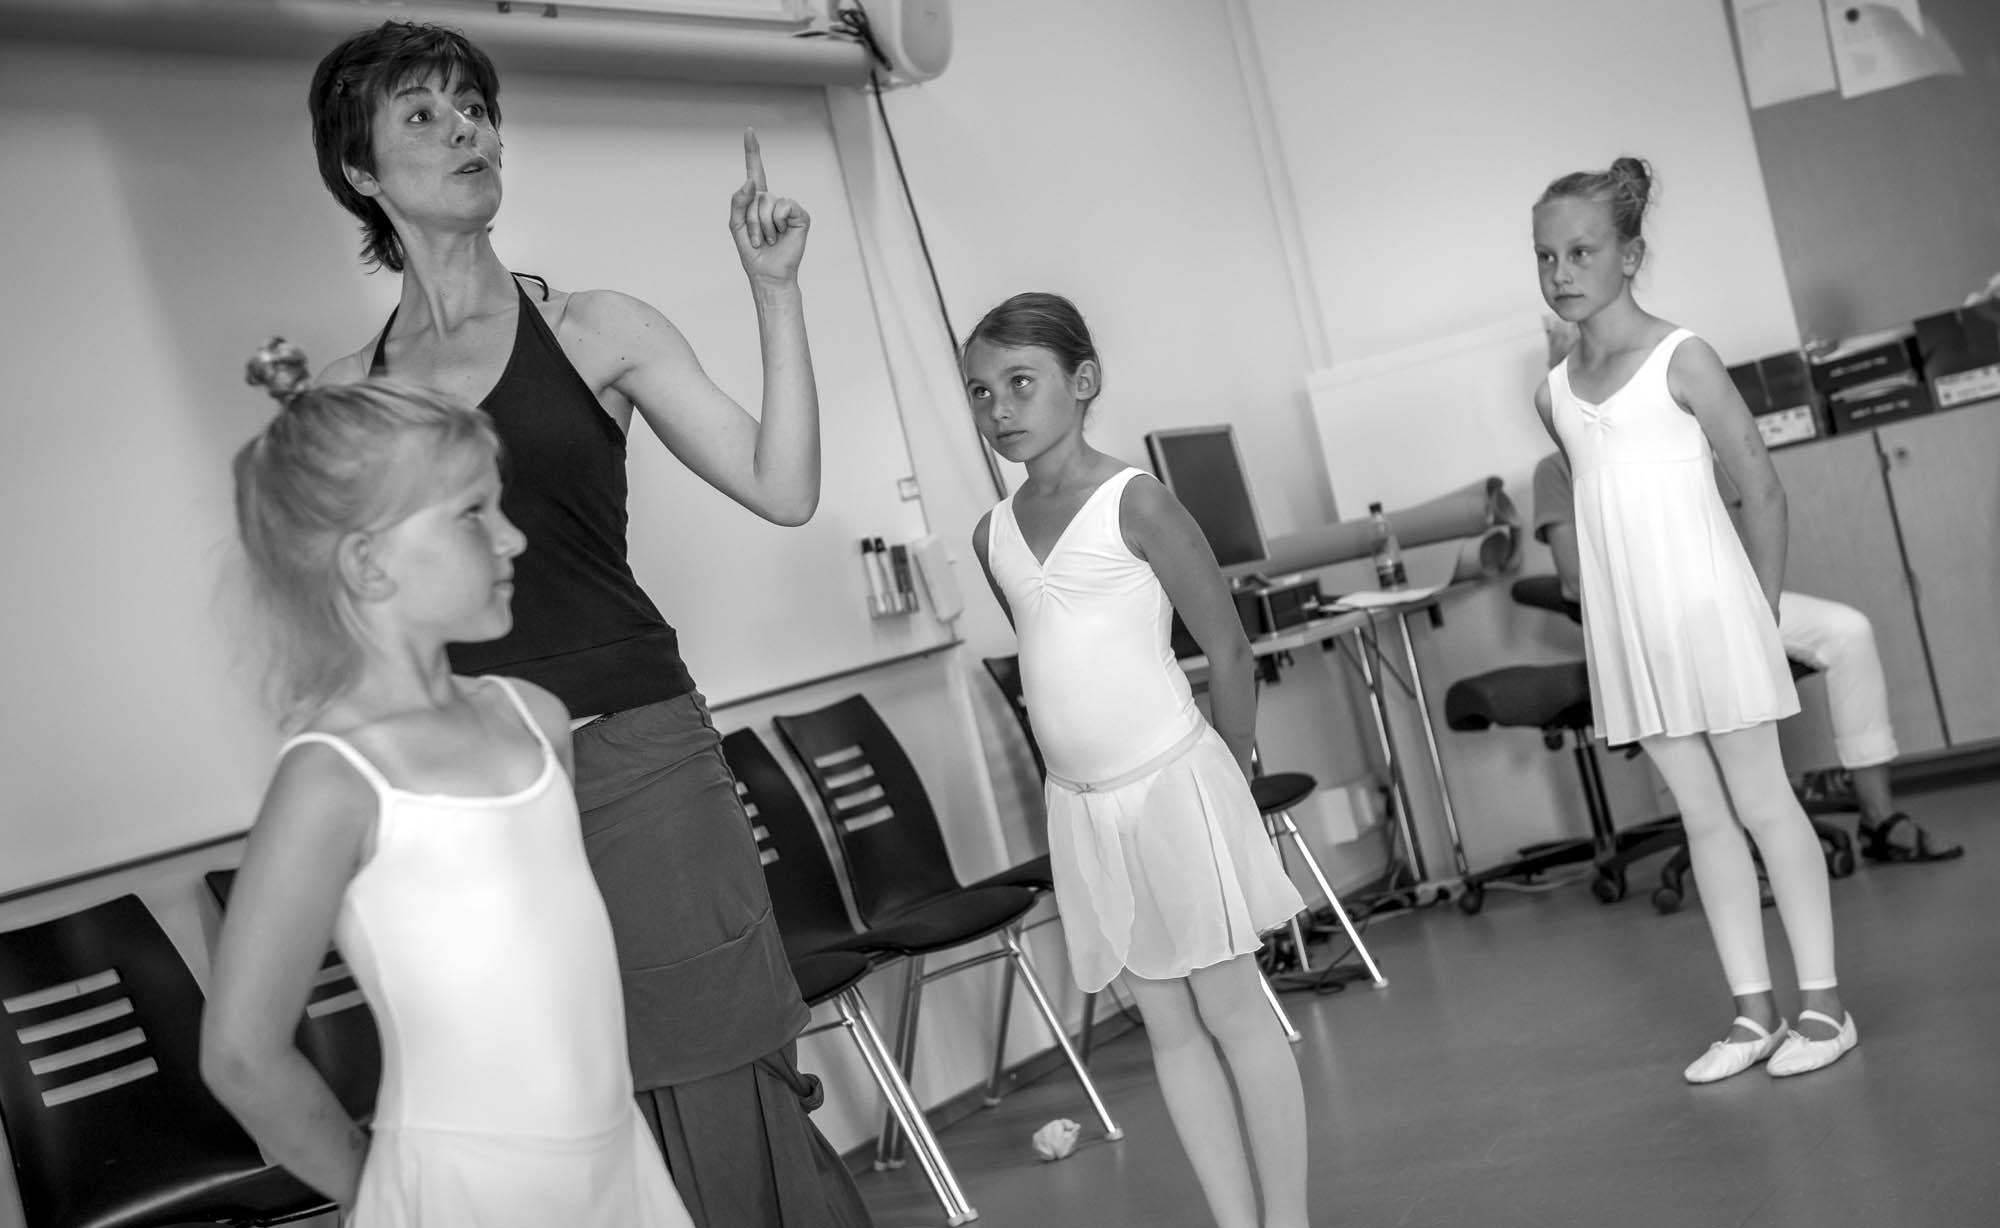 ballettest (5 of 10)